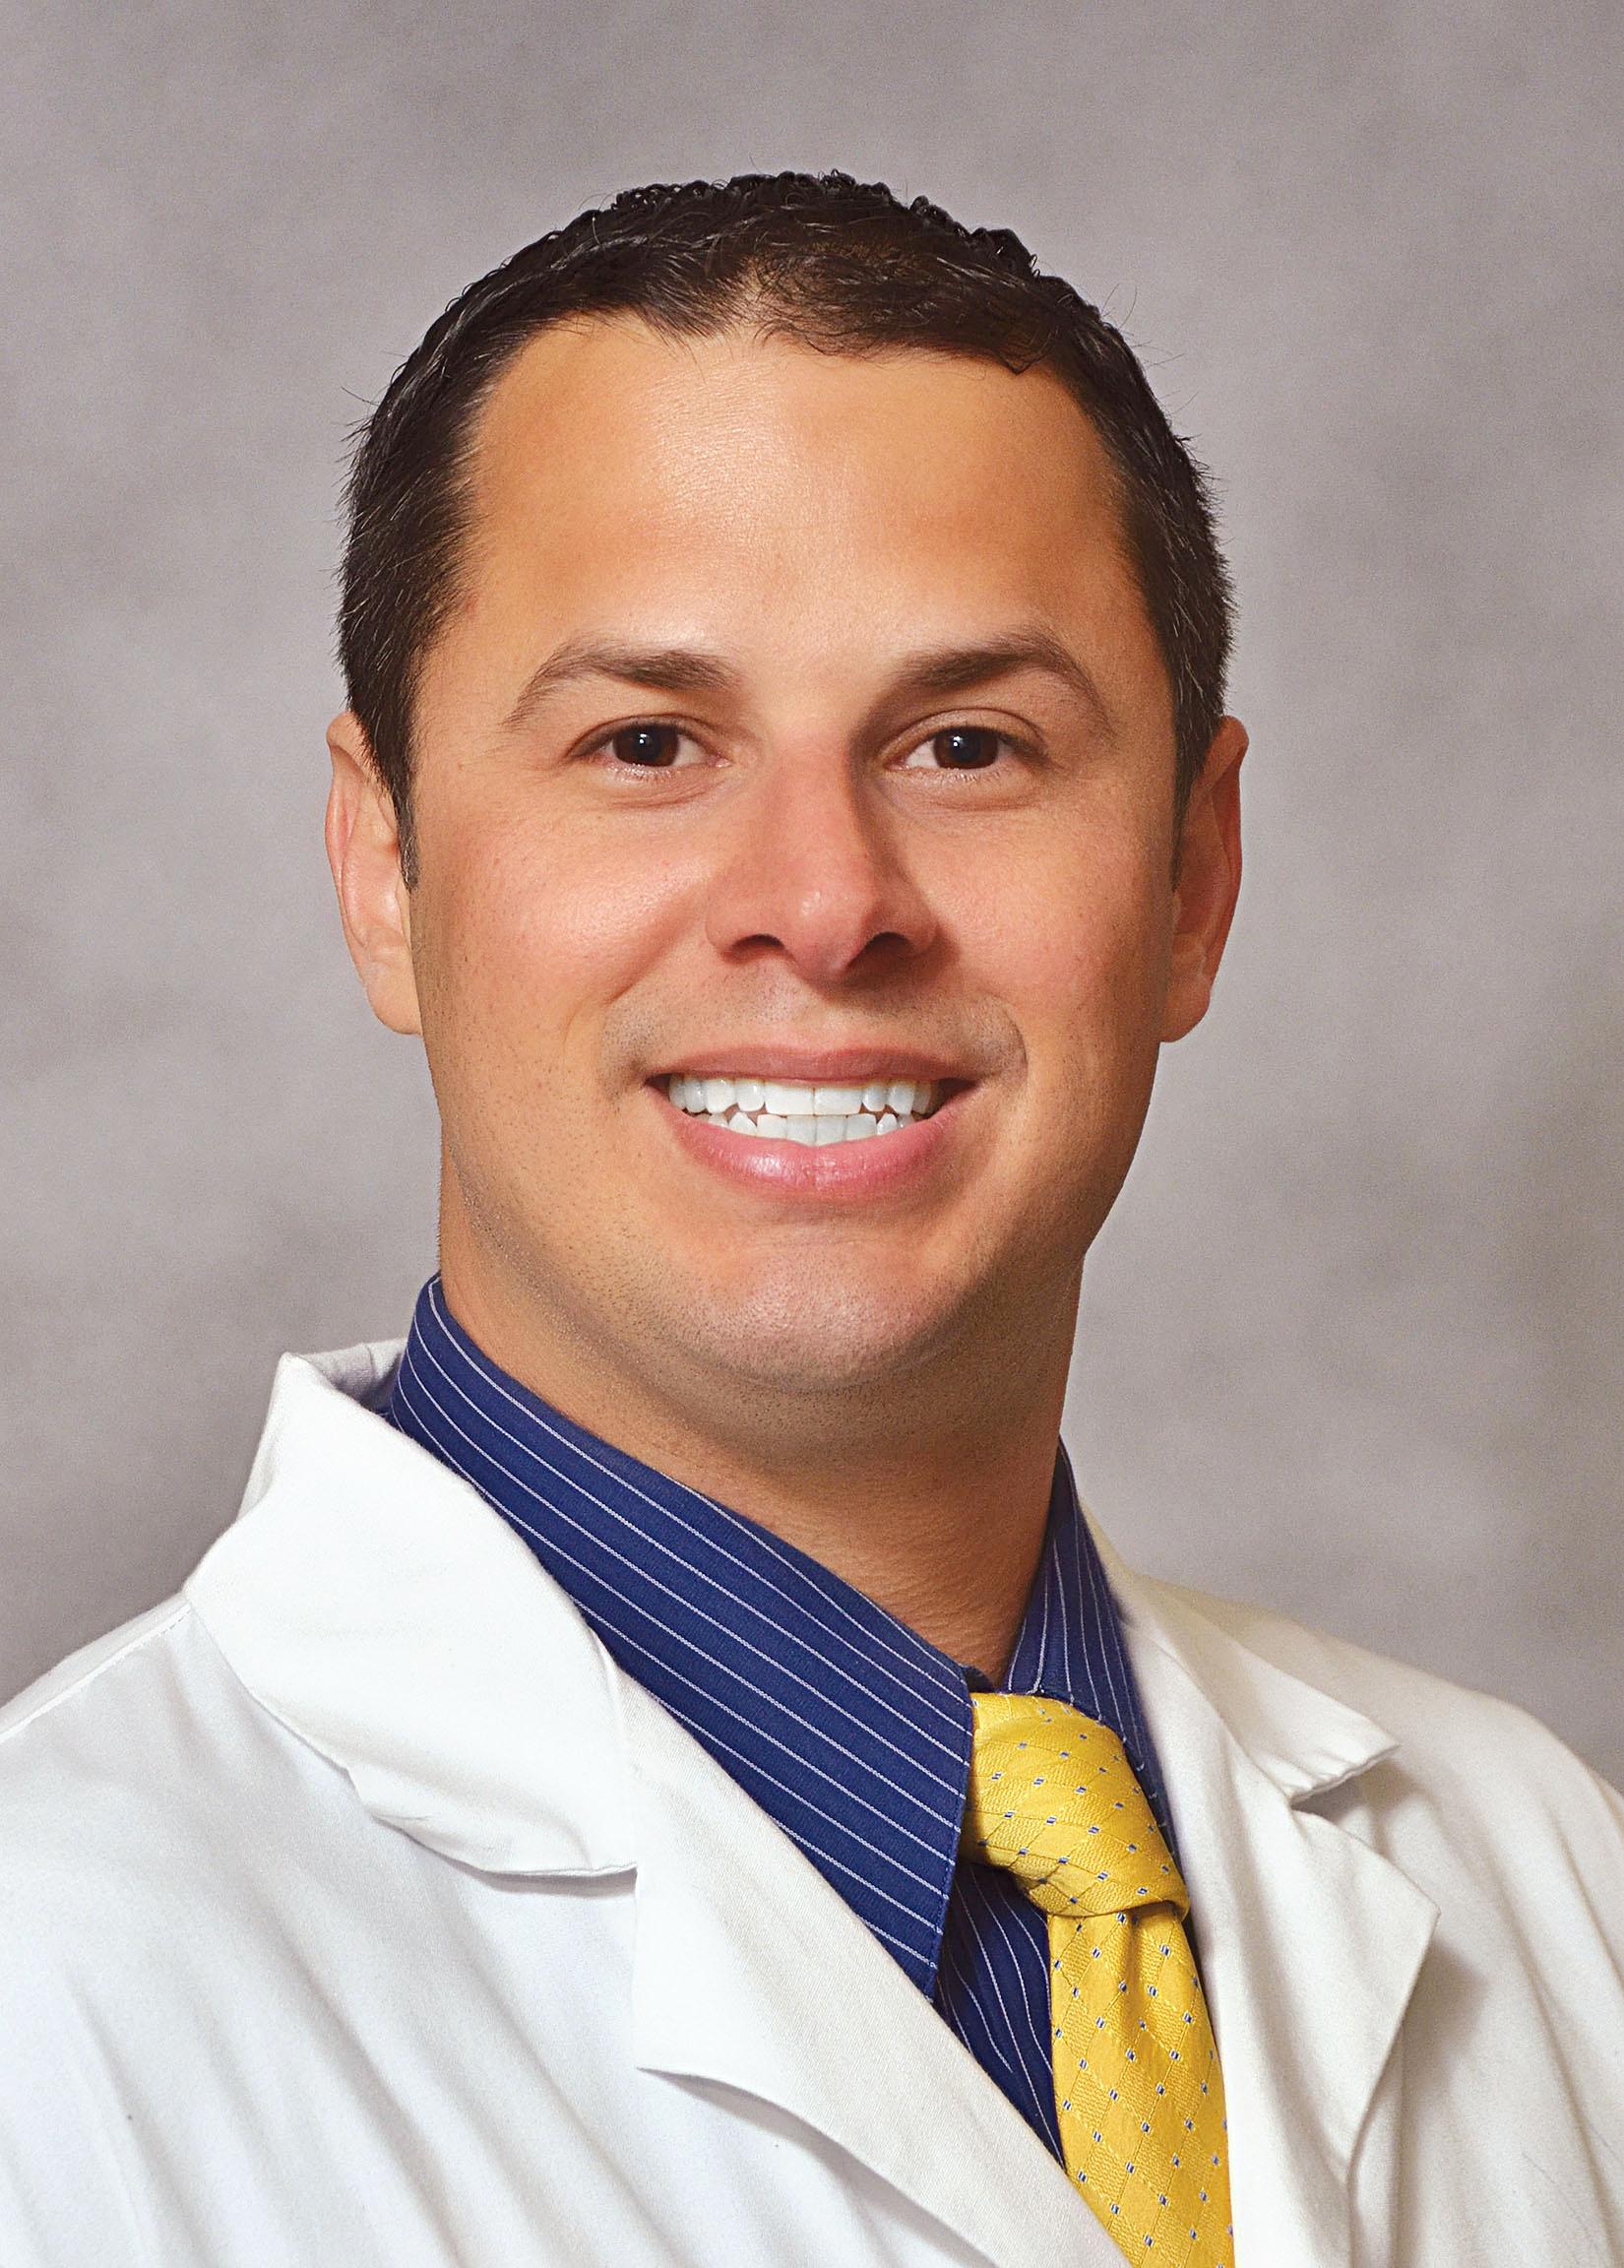 Noah Goldfarb, MD